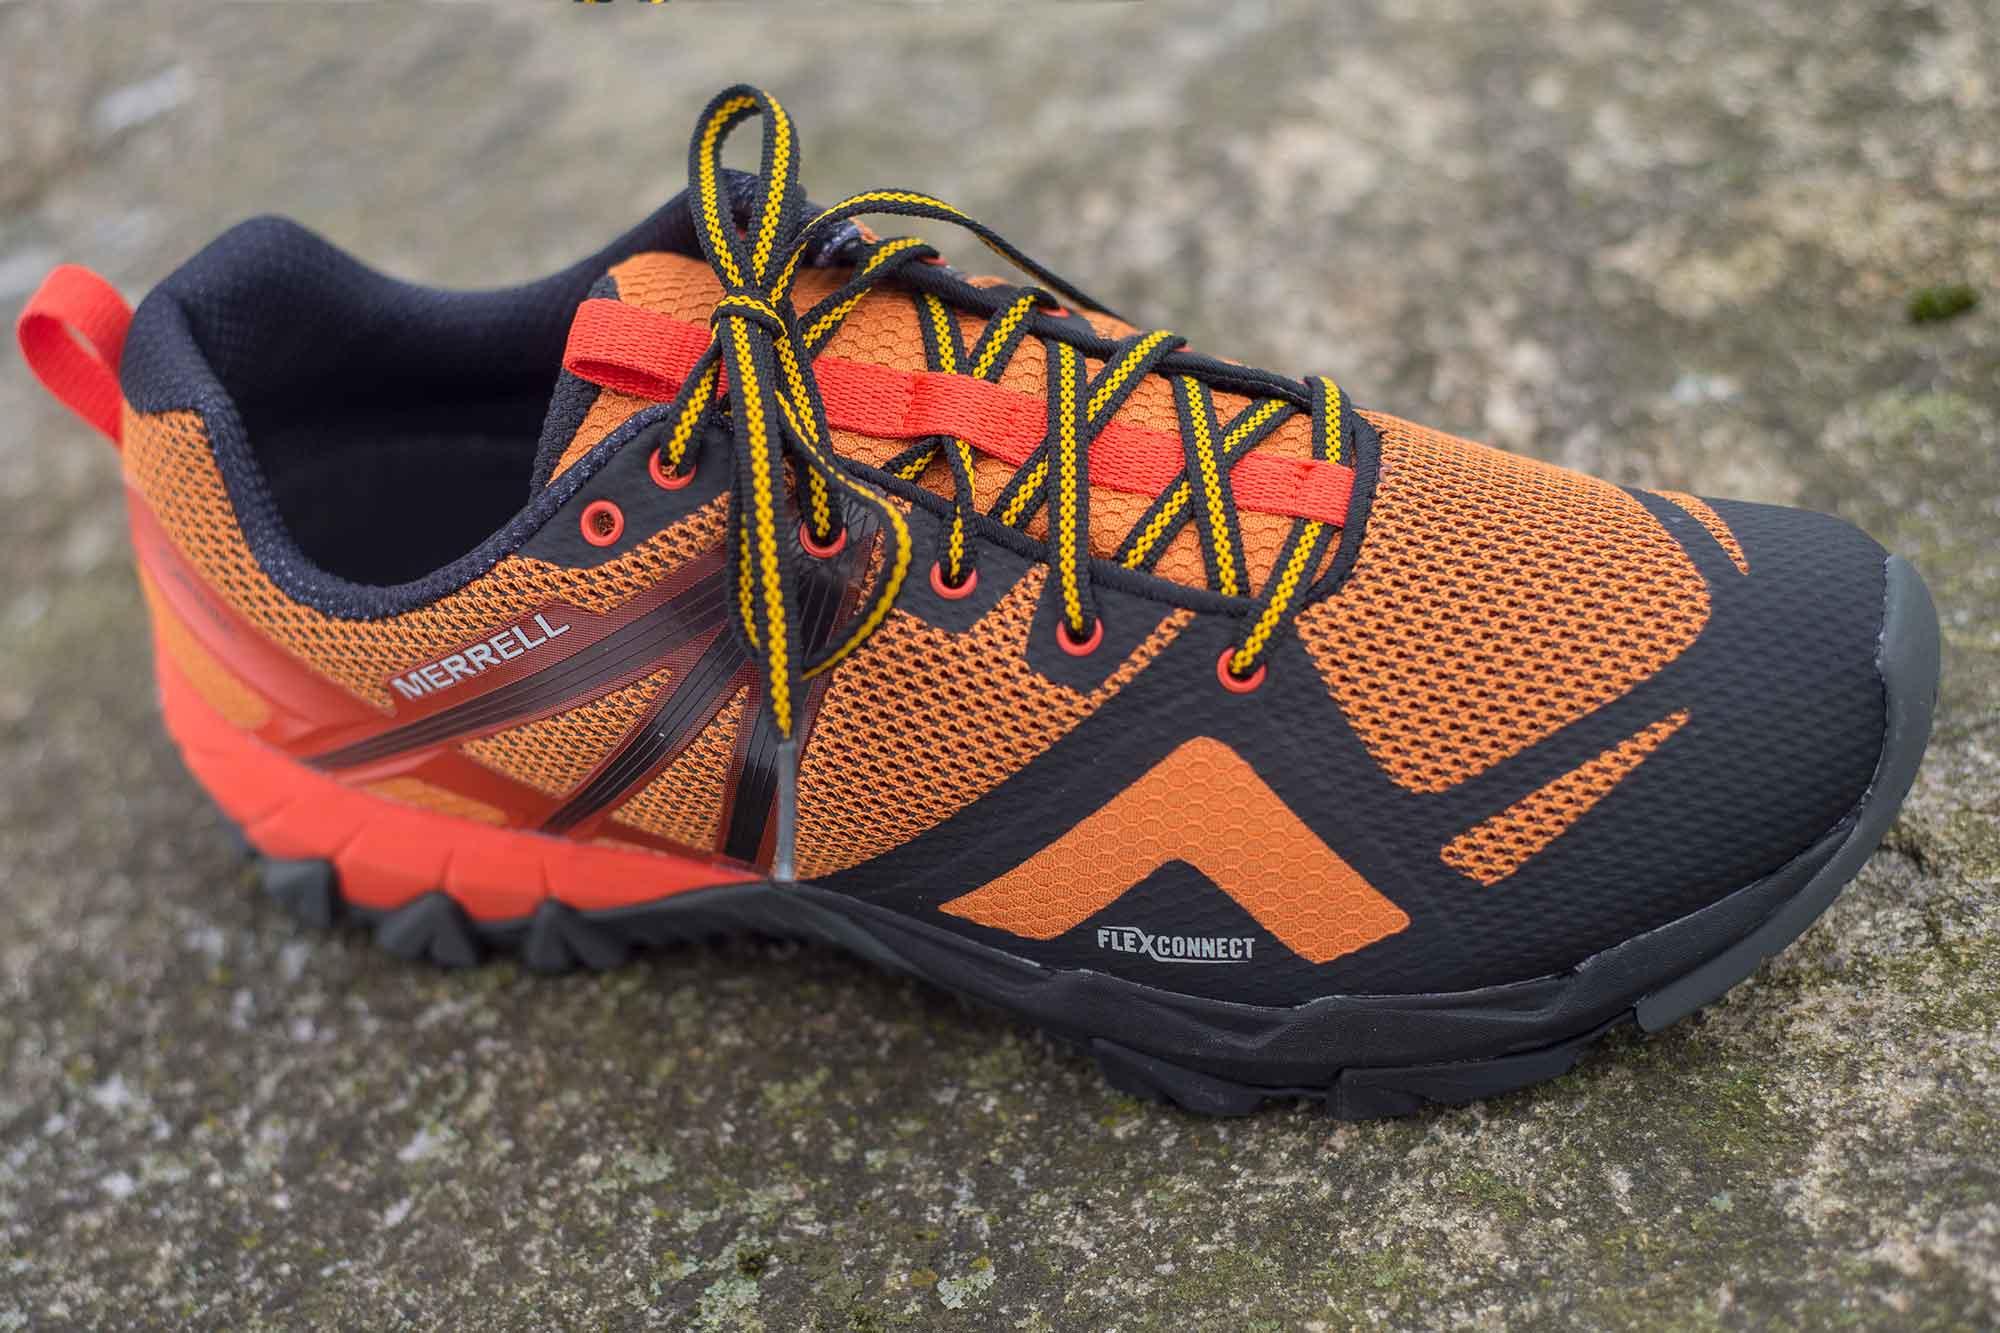 Merrell MQM FLEX 'Hybrid' Trail Shoe